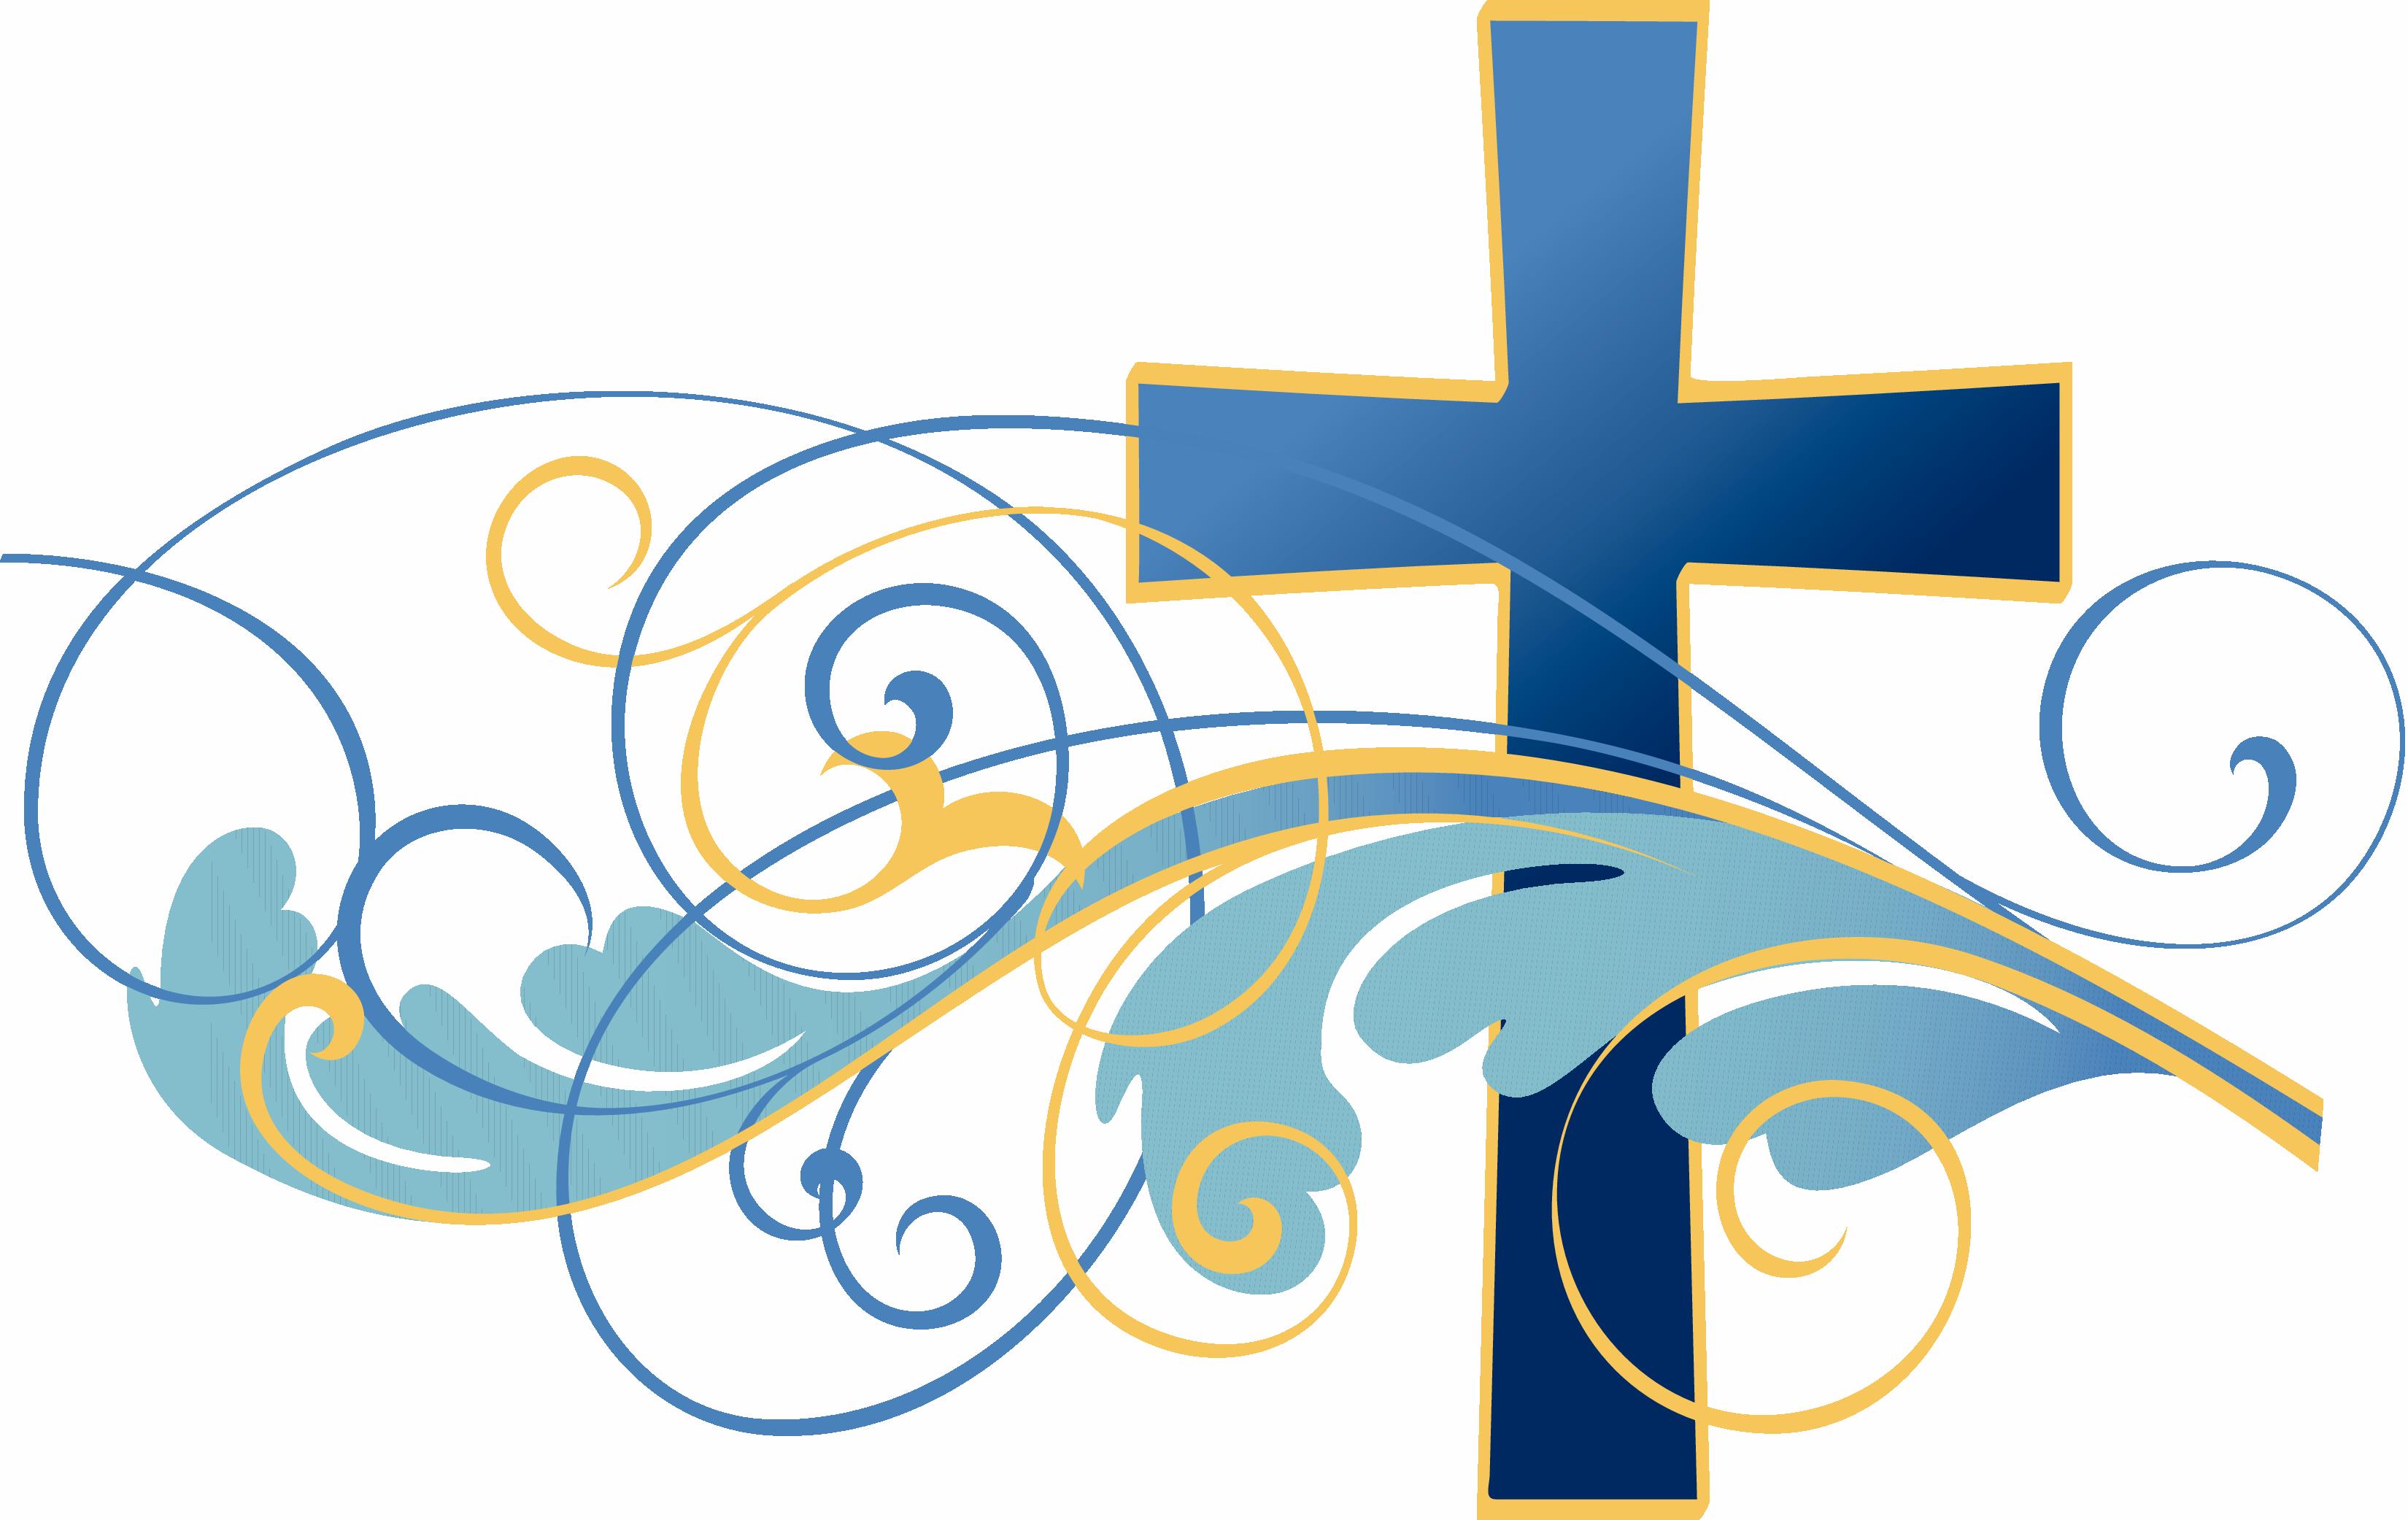 Baptism cross clipart clip art transparent Baptism Is Immersion | Robert McAuthor Ministries clip art transparent